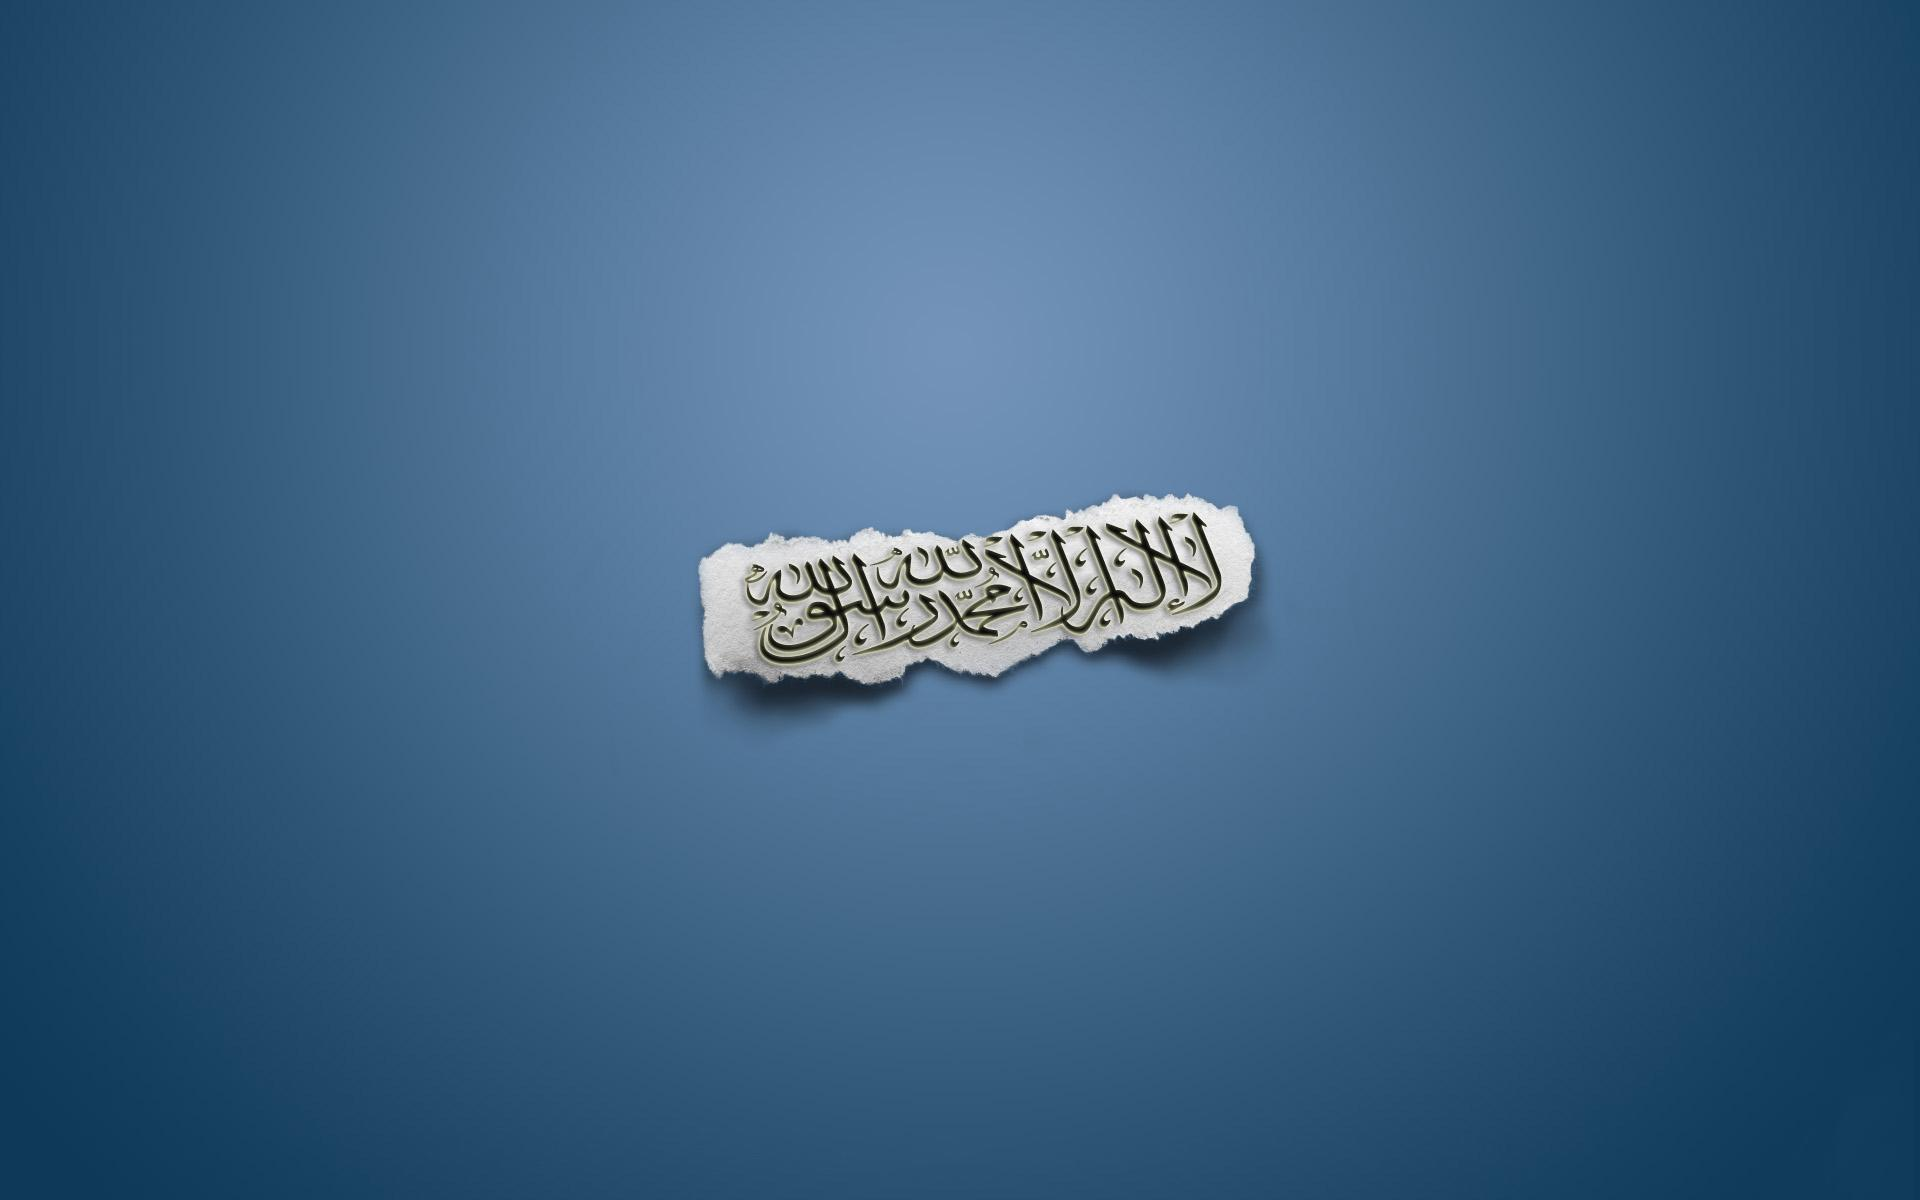 Wonderbaar Islamic Wallpapers HD Pro for Android - APK Download ZD-23